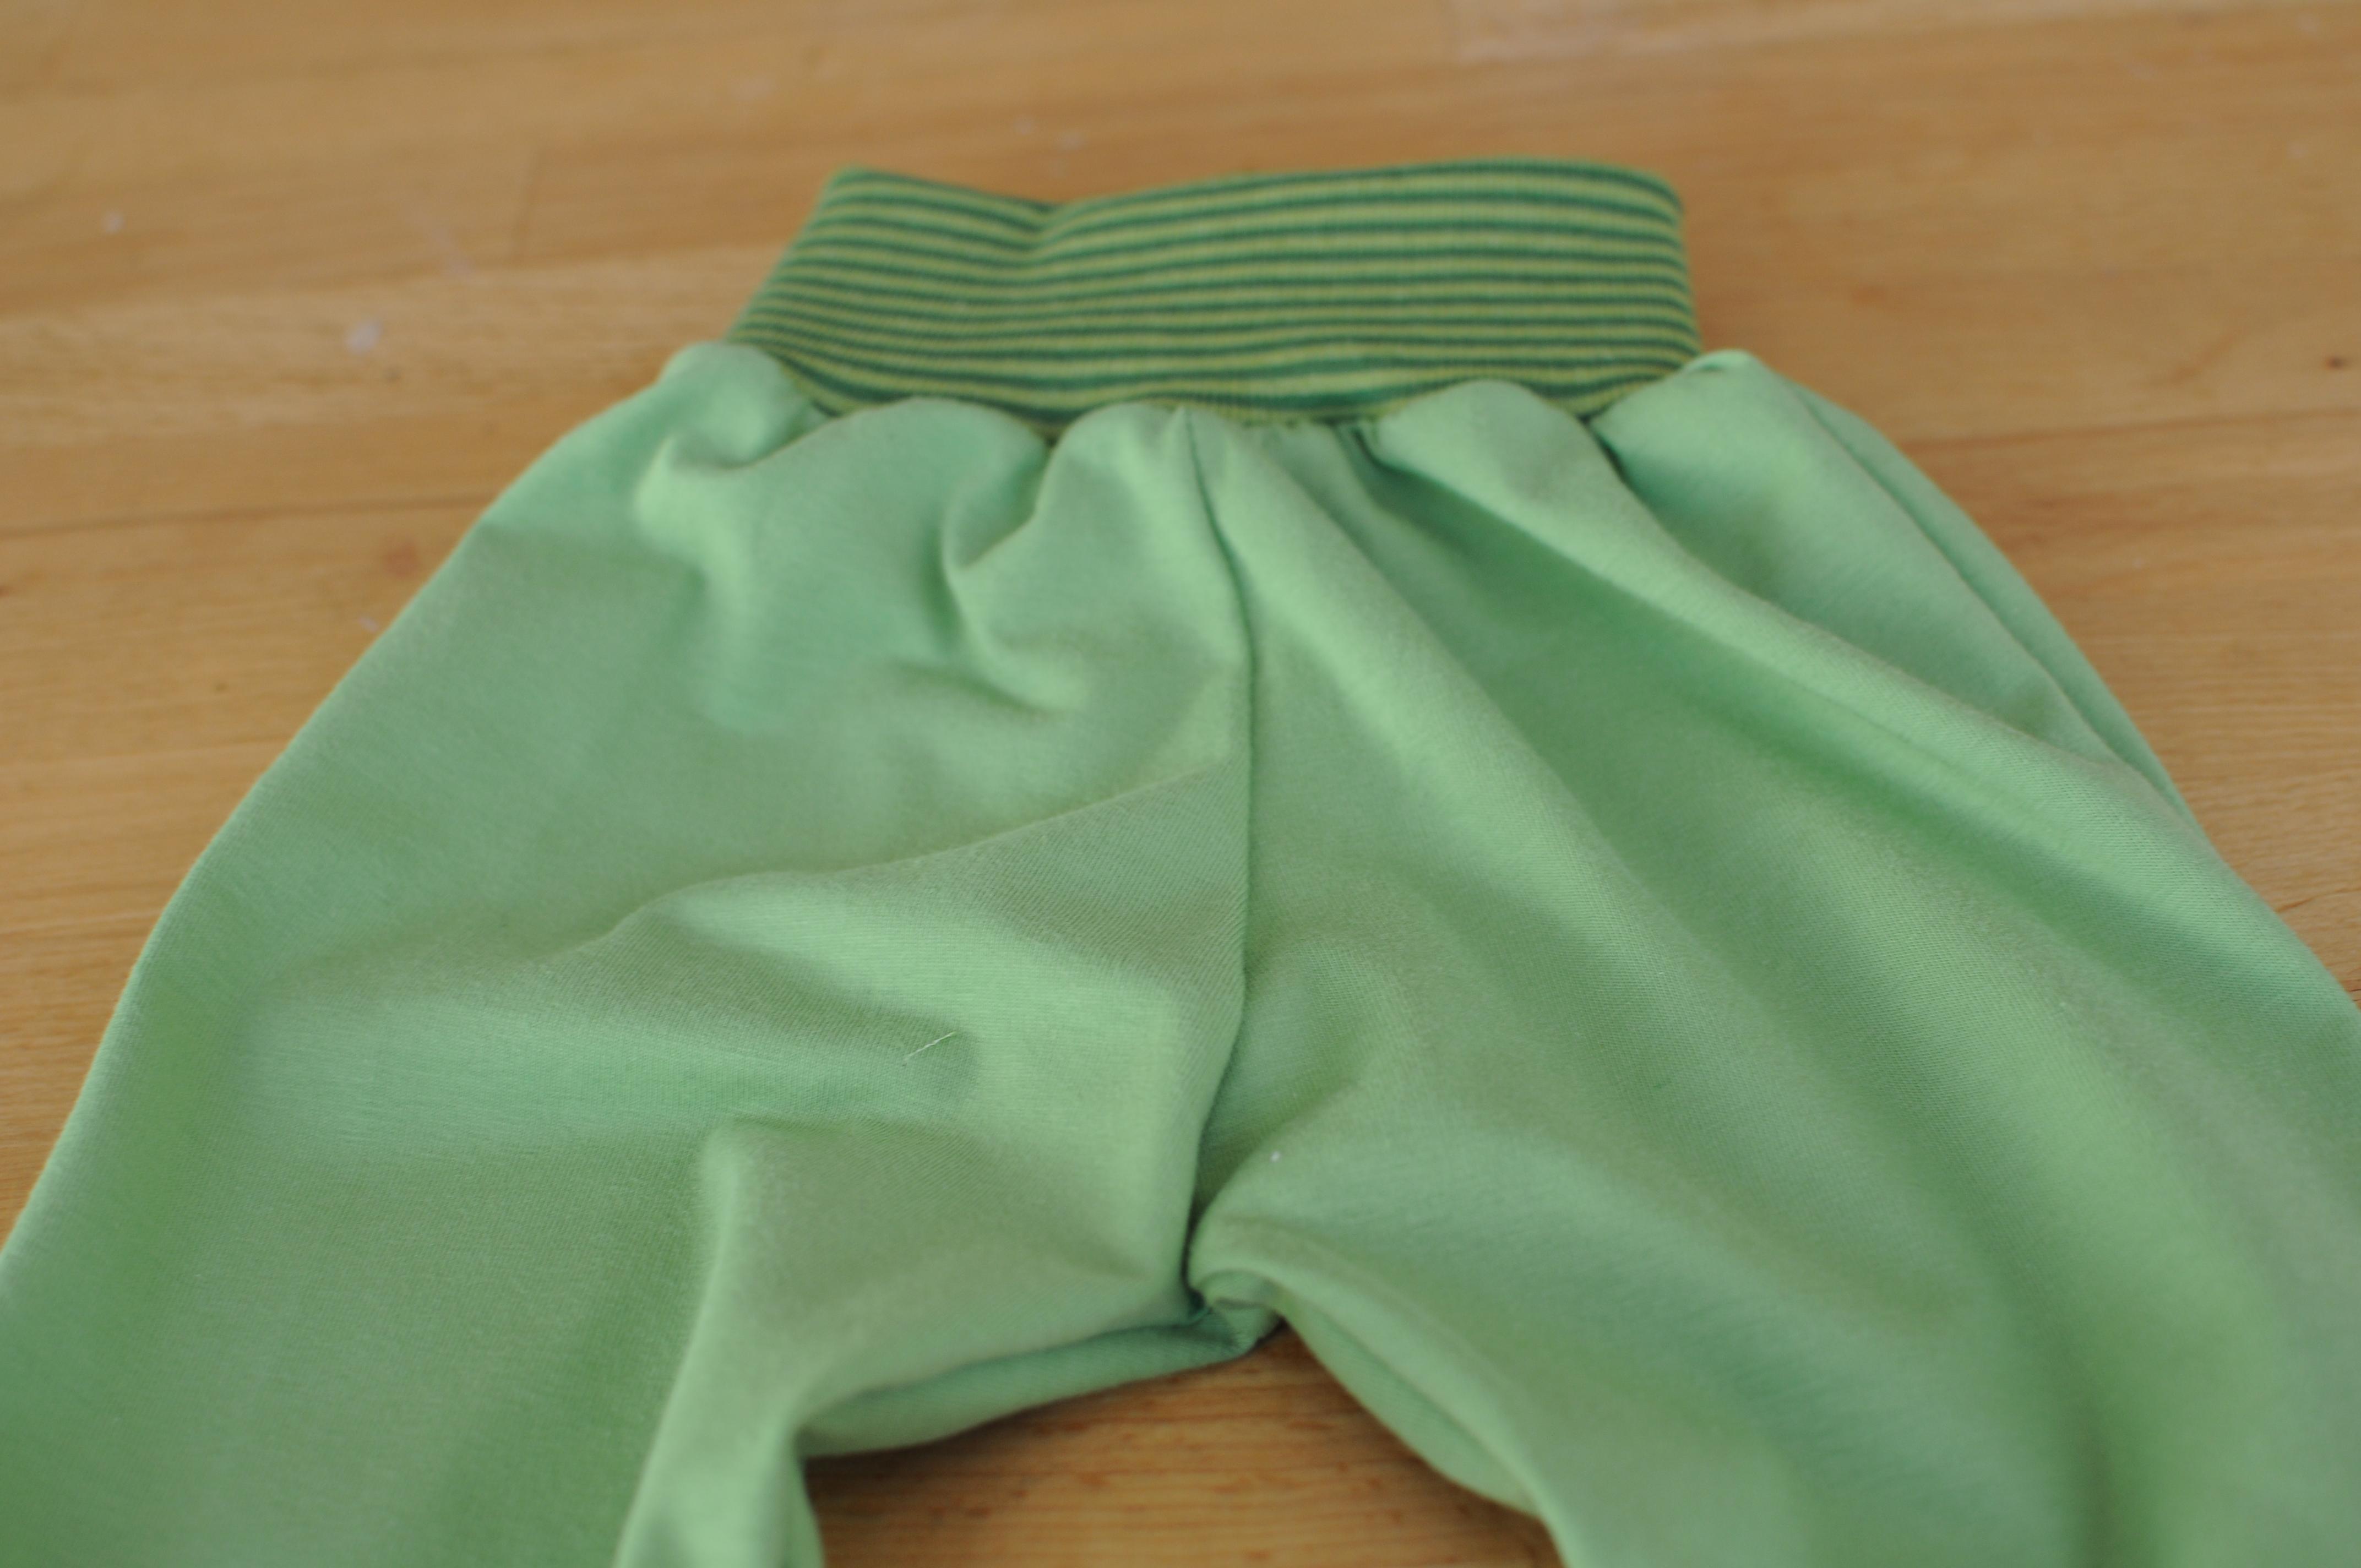 Kuhschlafanzug_Hose_gesamt